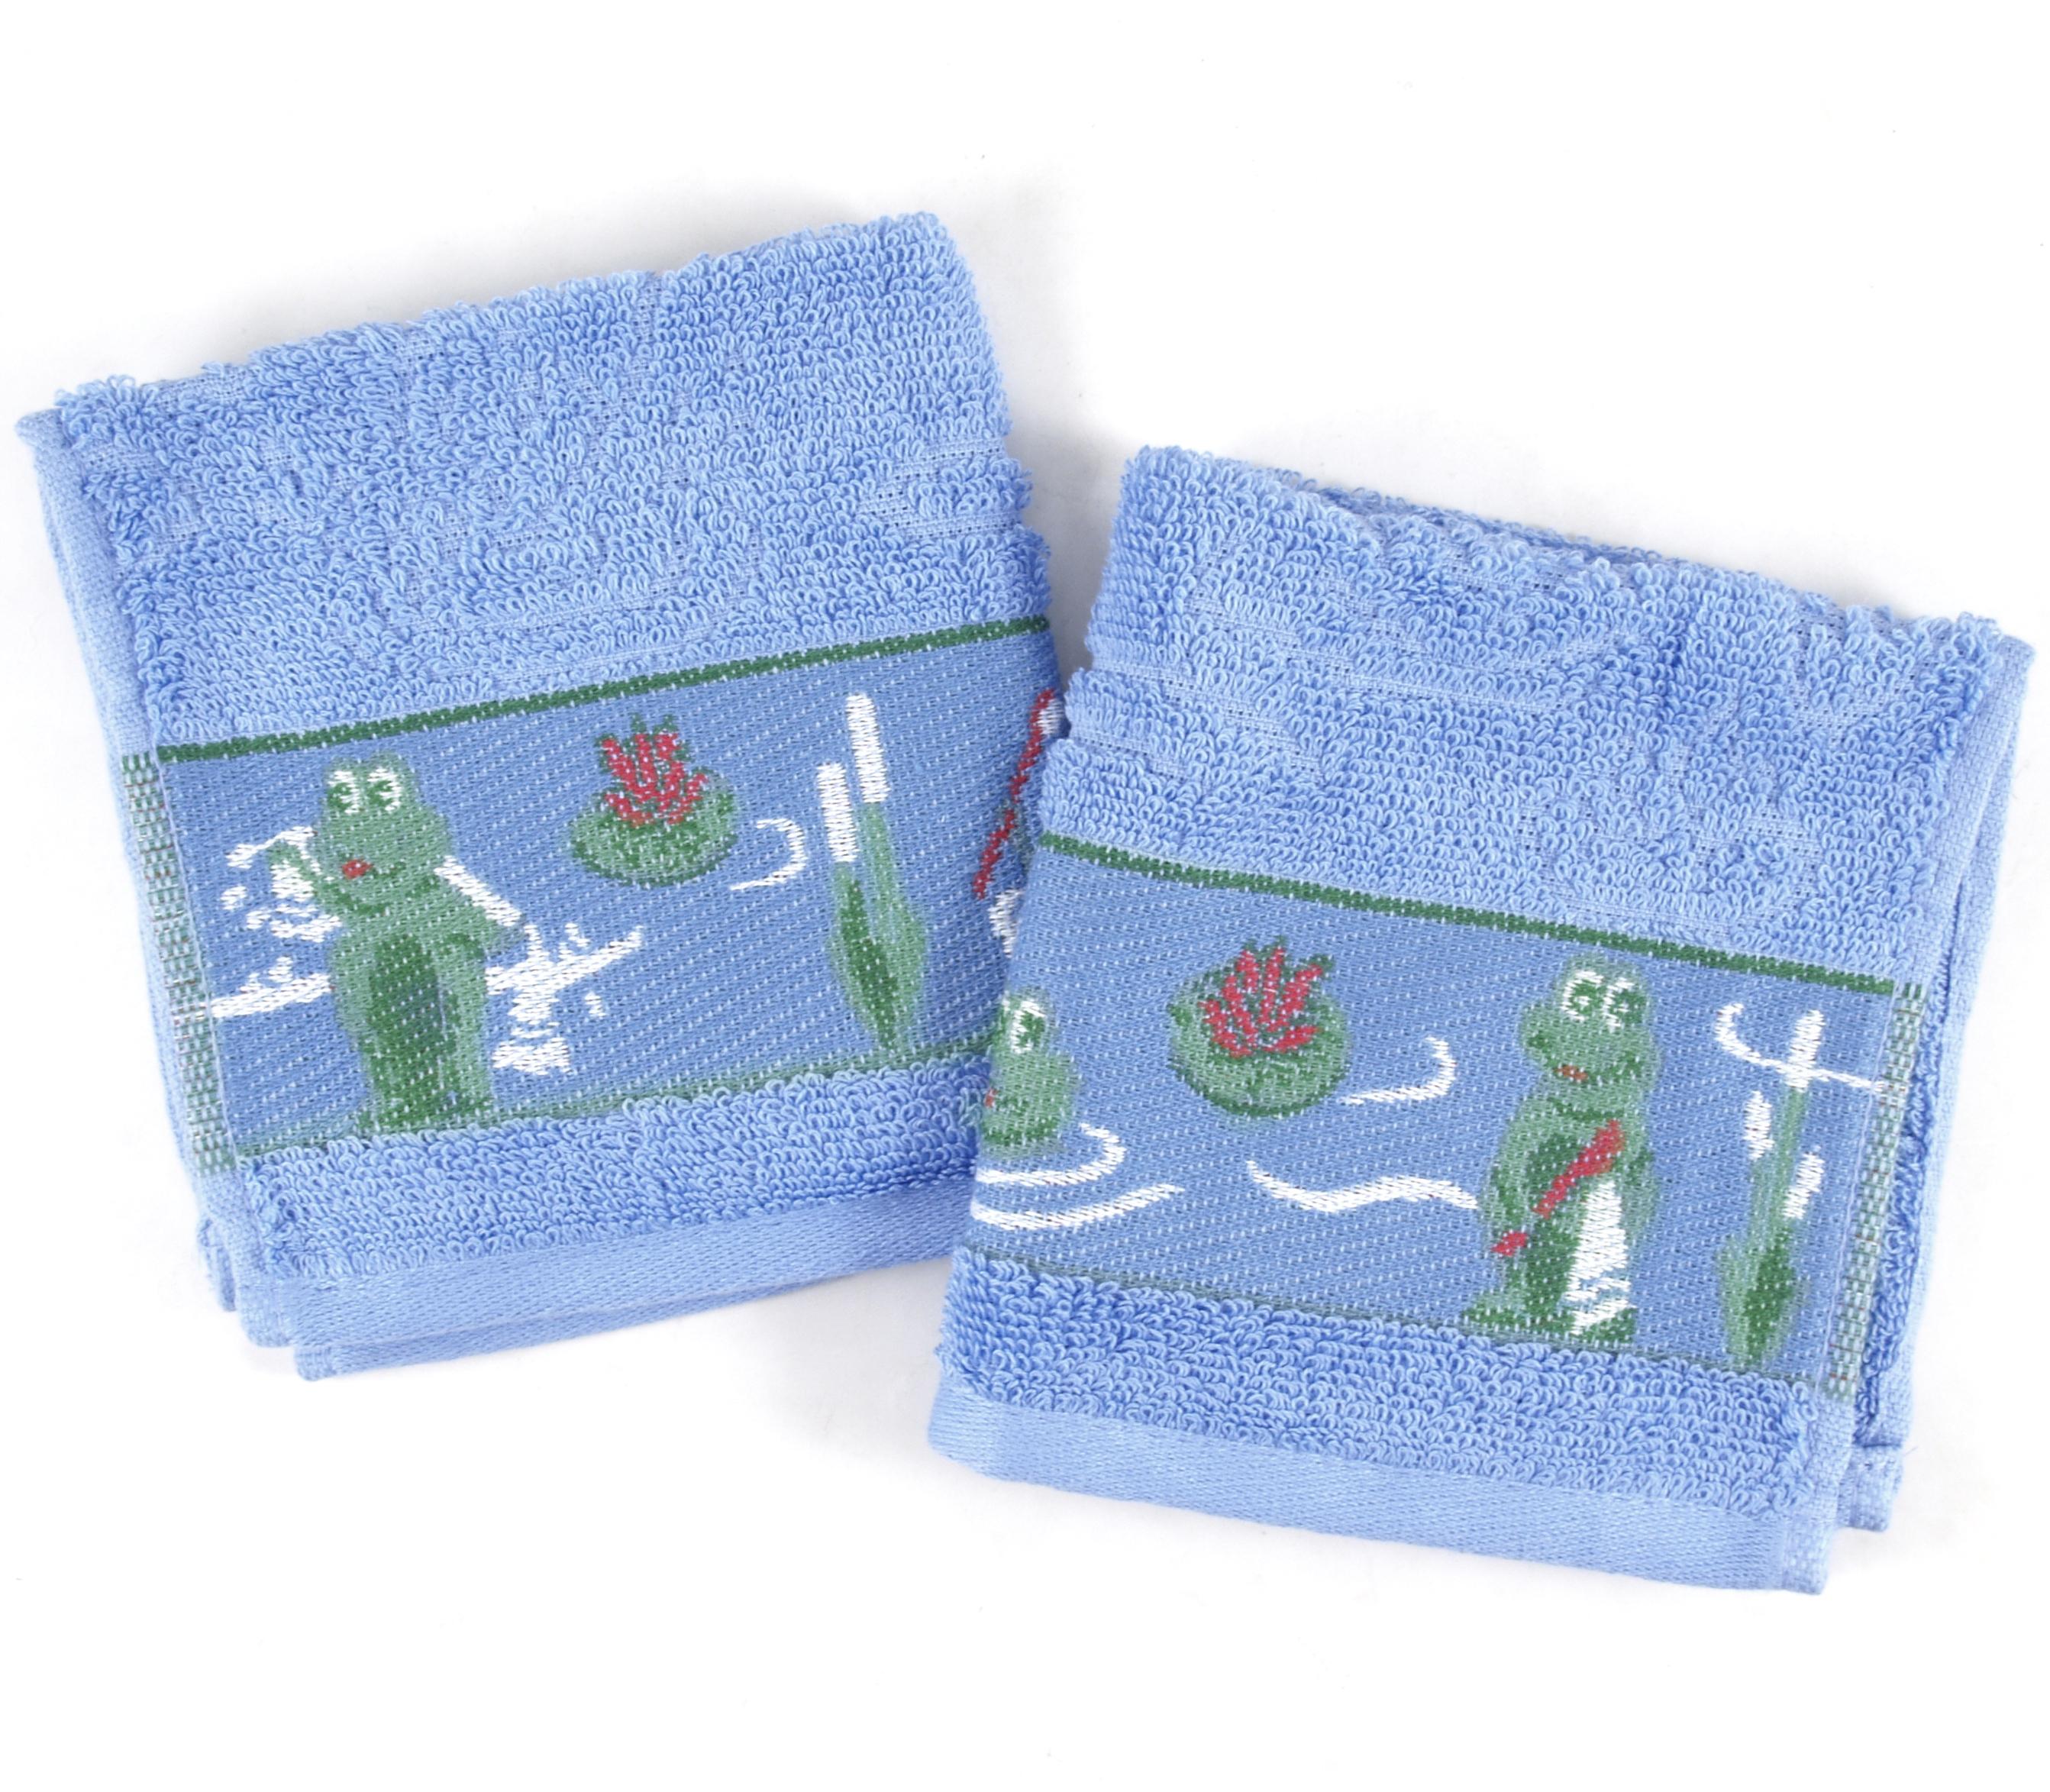 Froggy Blue Cotton Washcloths 12x12, Set of 2